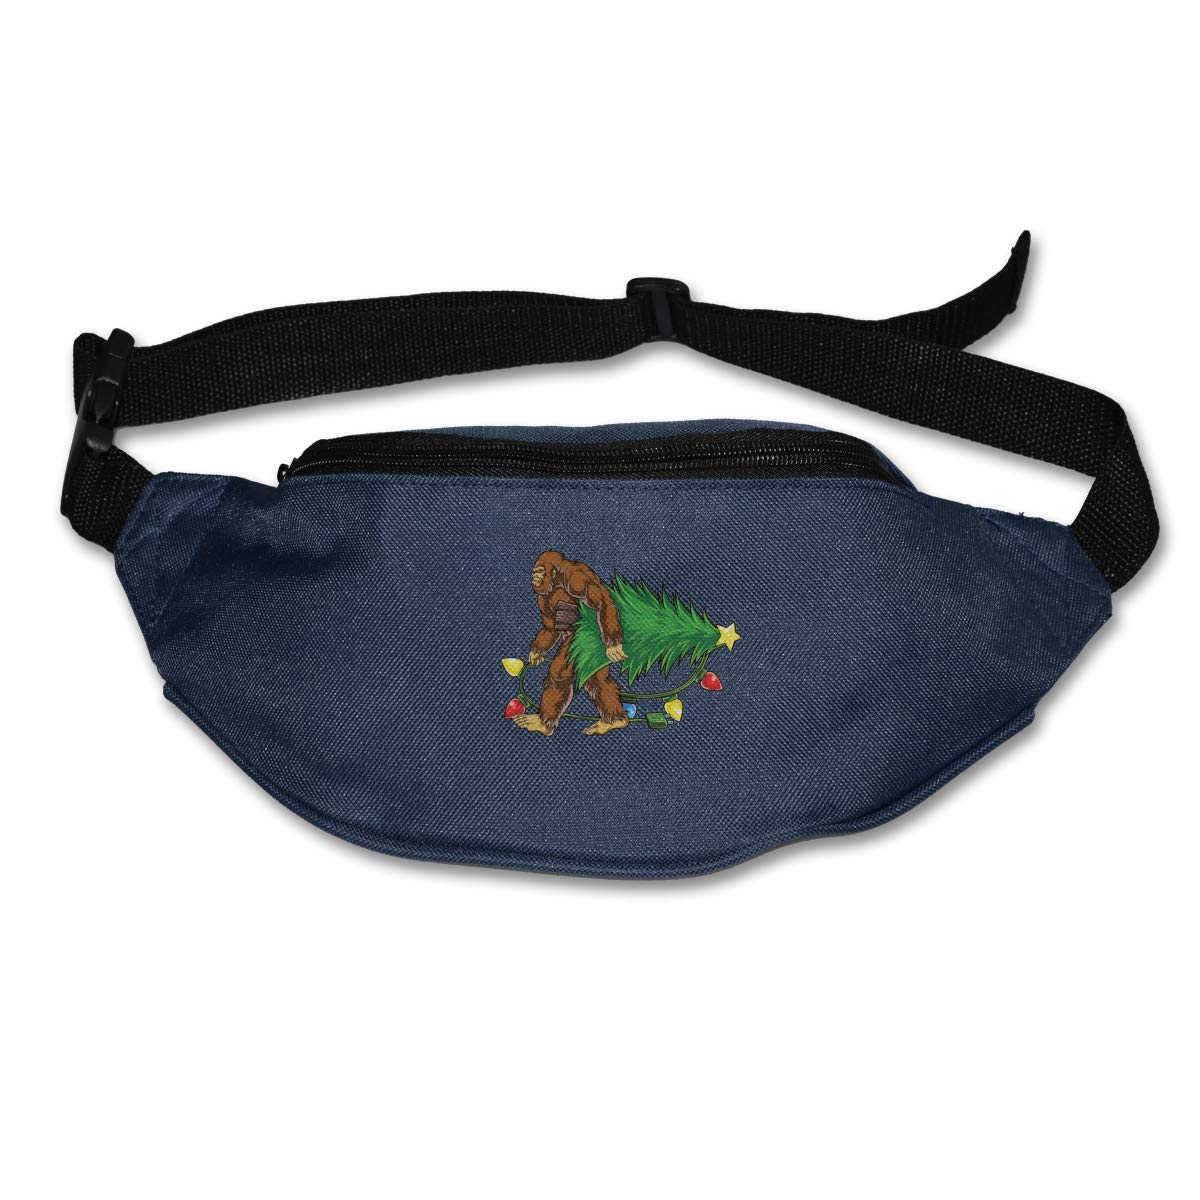 Bigfoot Carrying Christmas Sport Waist Bag Fanny Pack Adjustable For Travel